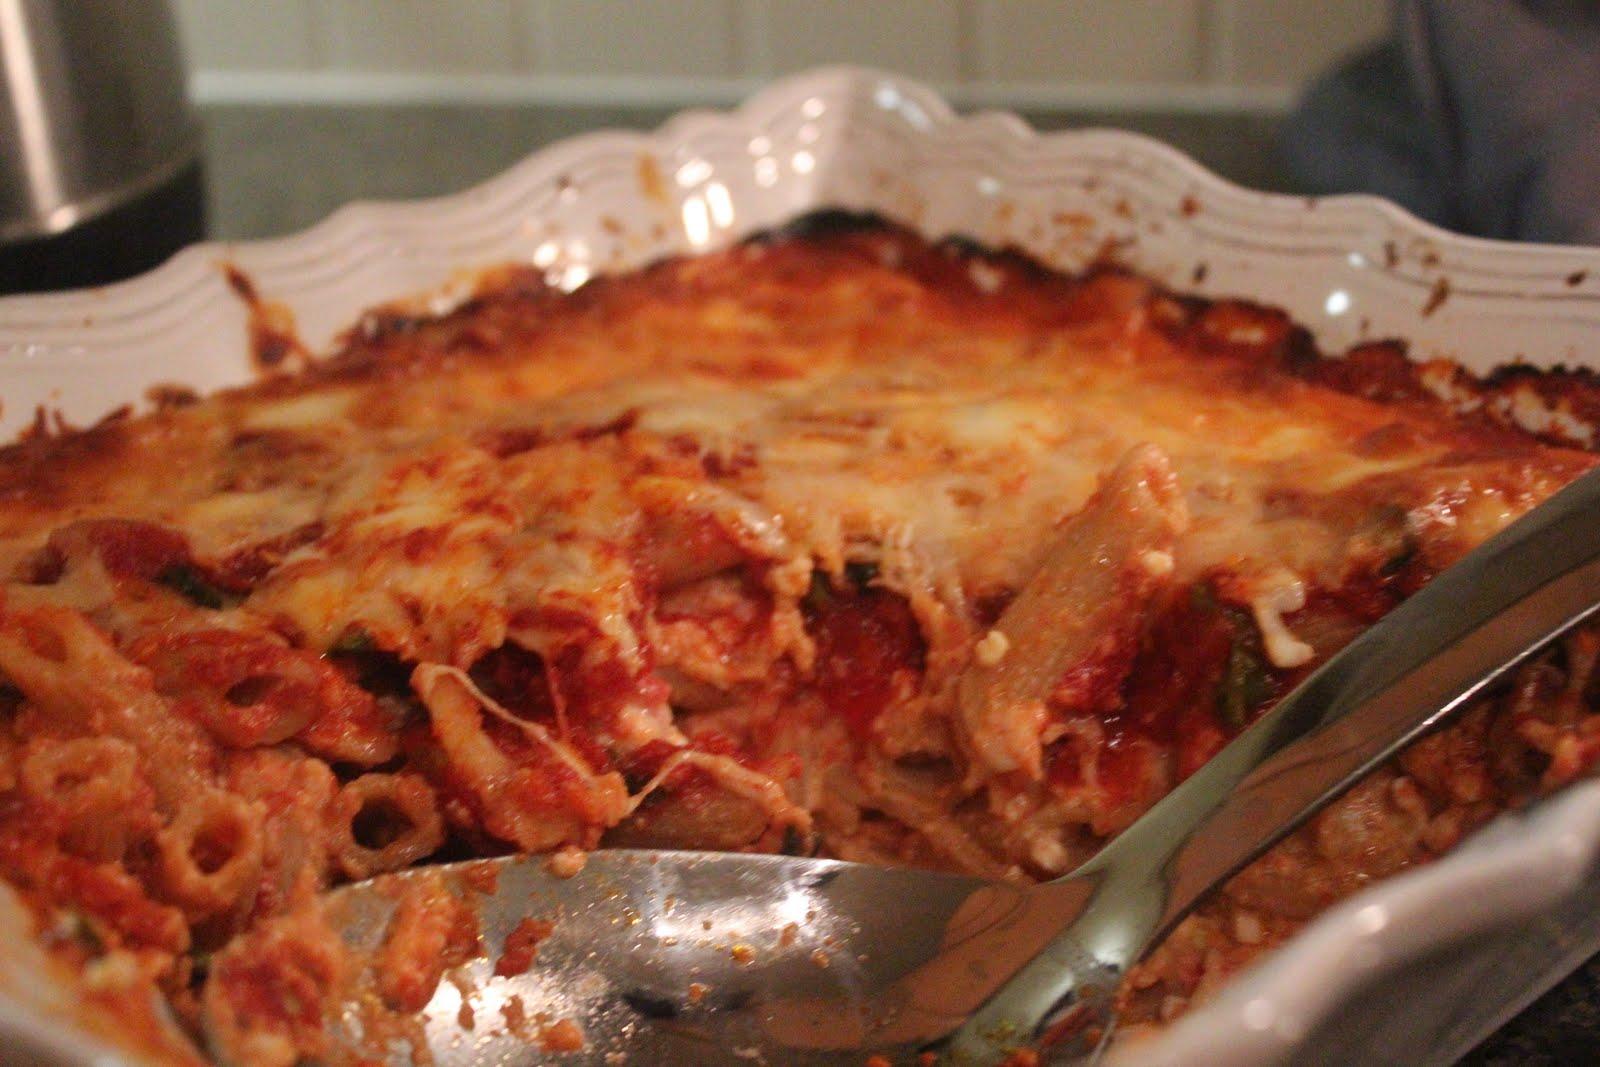 America's Test Kitchen Baked Ziti